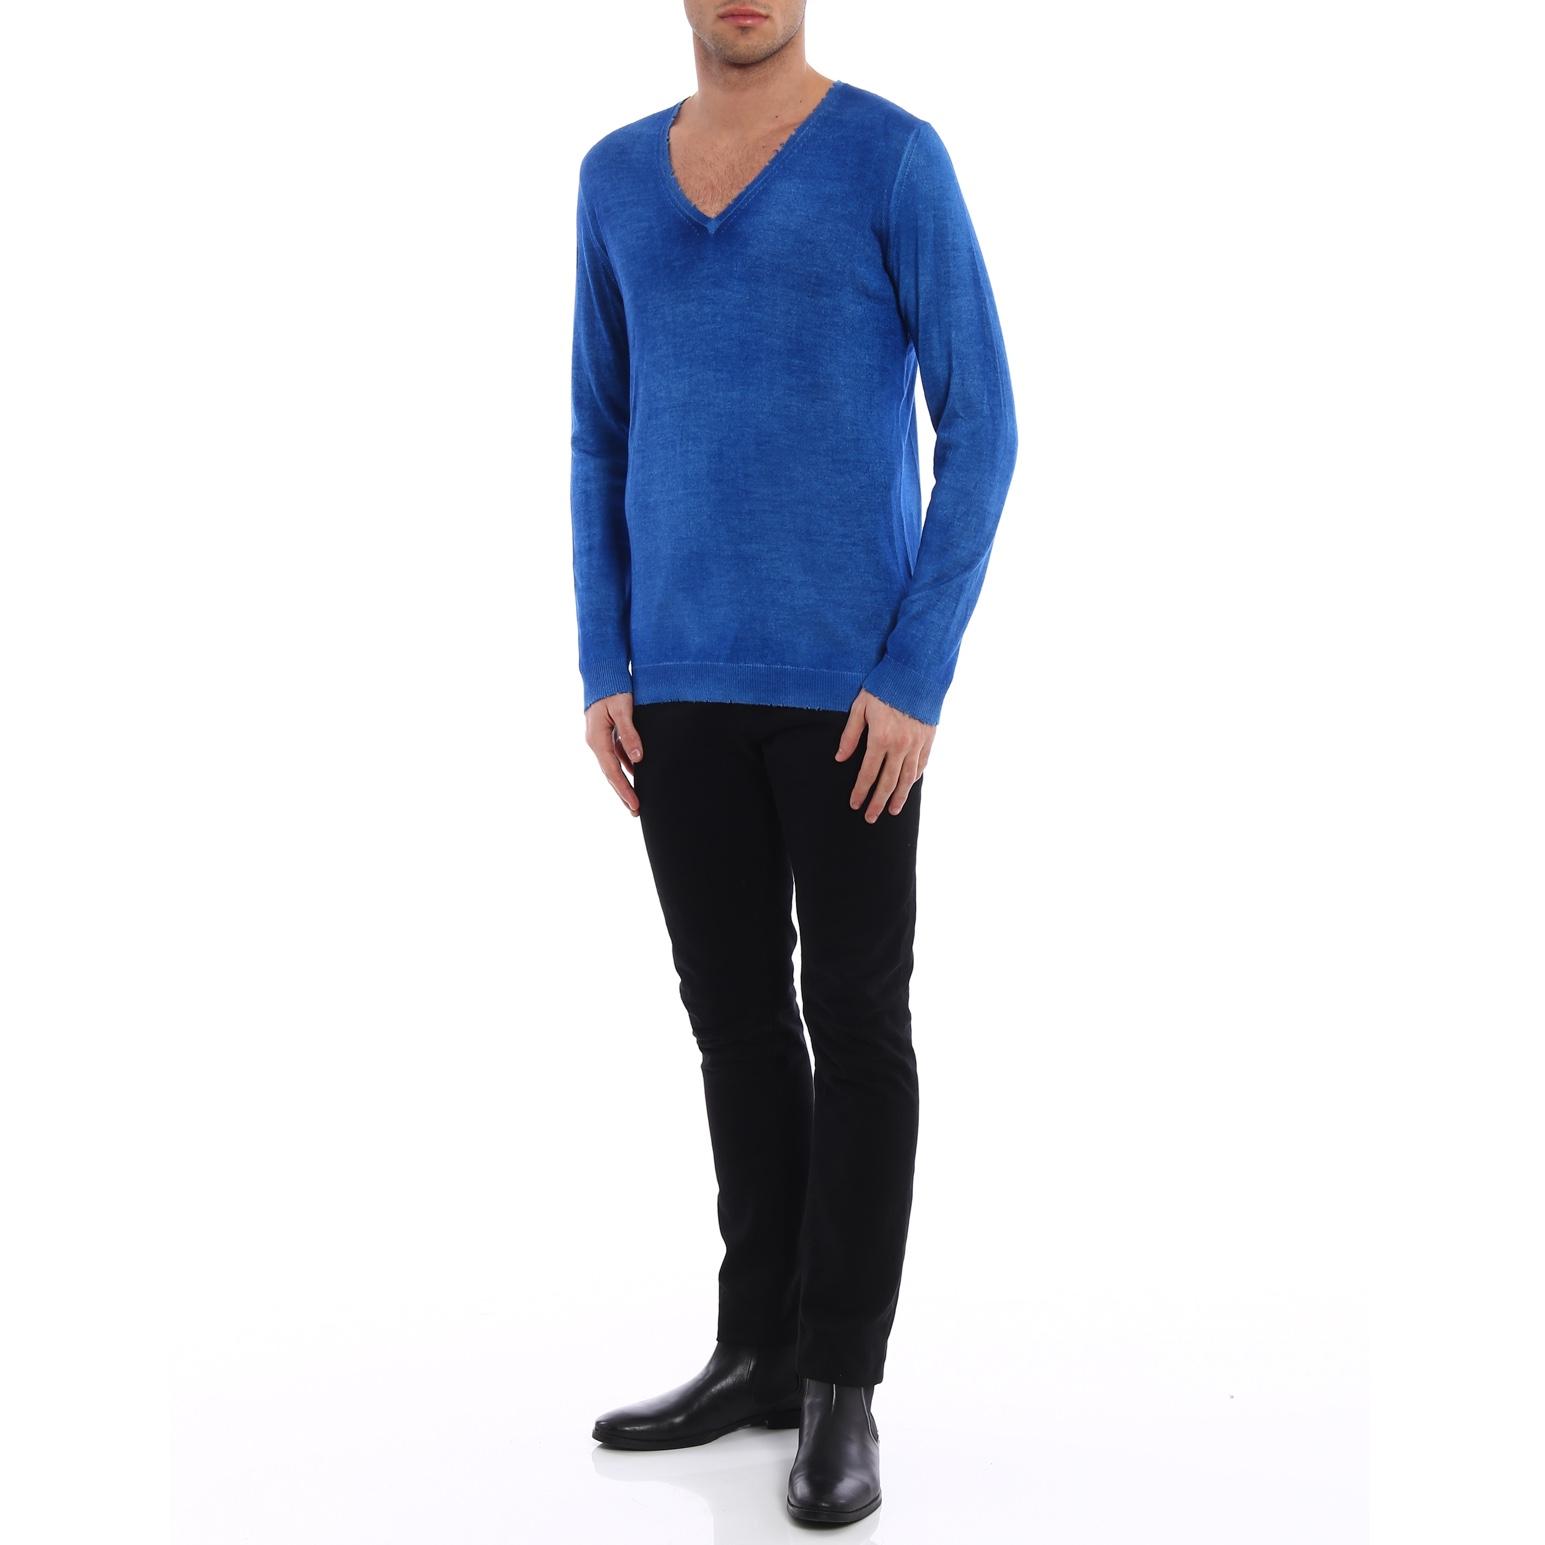 avant-toi-online-v-necks-cashmere-and-silk-destroyed-sweater-00000121334f00s012.jpg